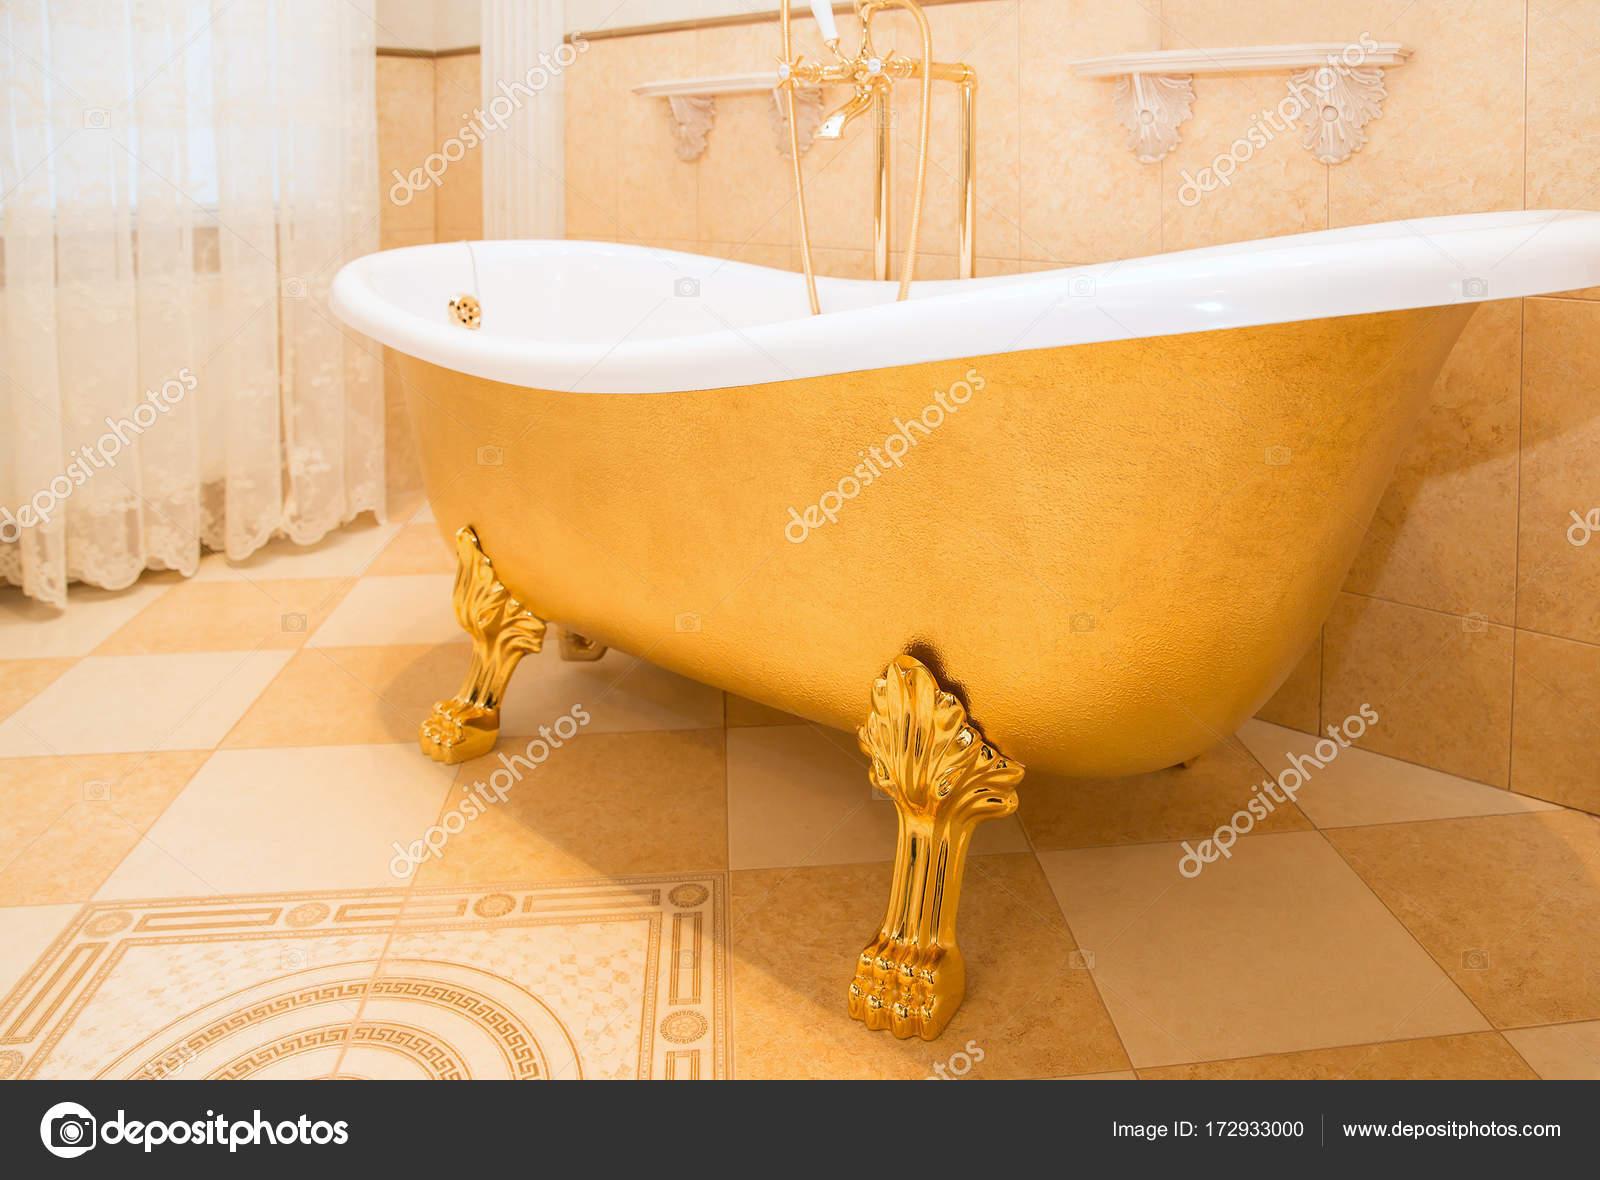 Old Fashioned Luxirious Golden Bath Tub Bathroom Stock Photo C Mariakray 172933000